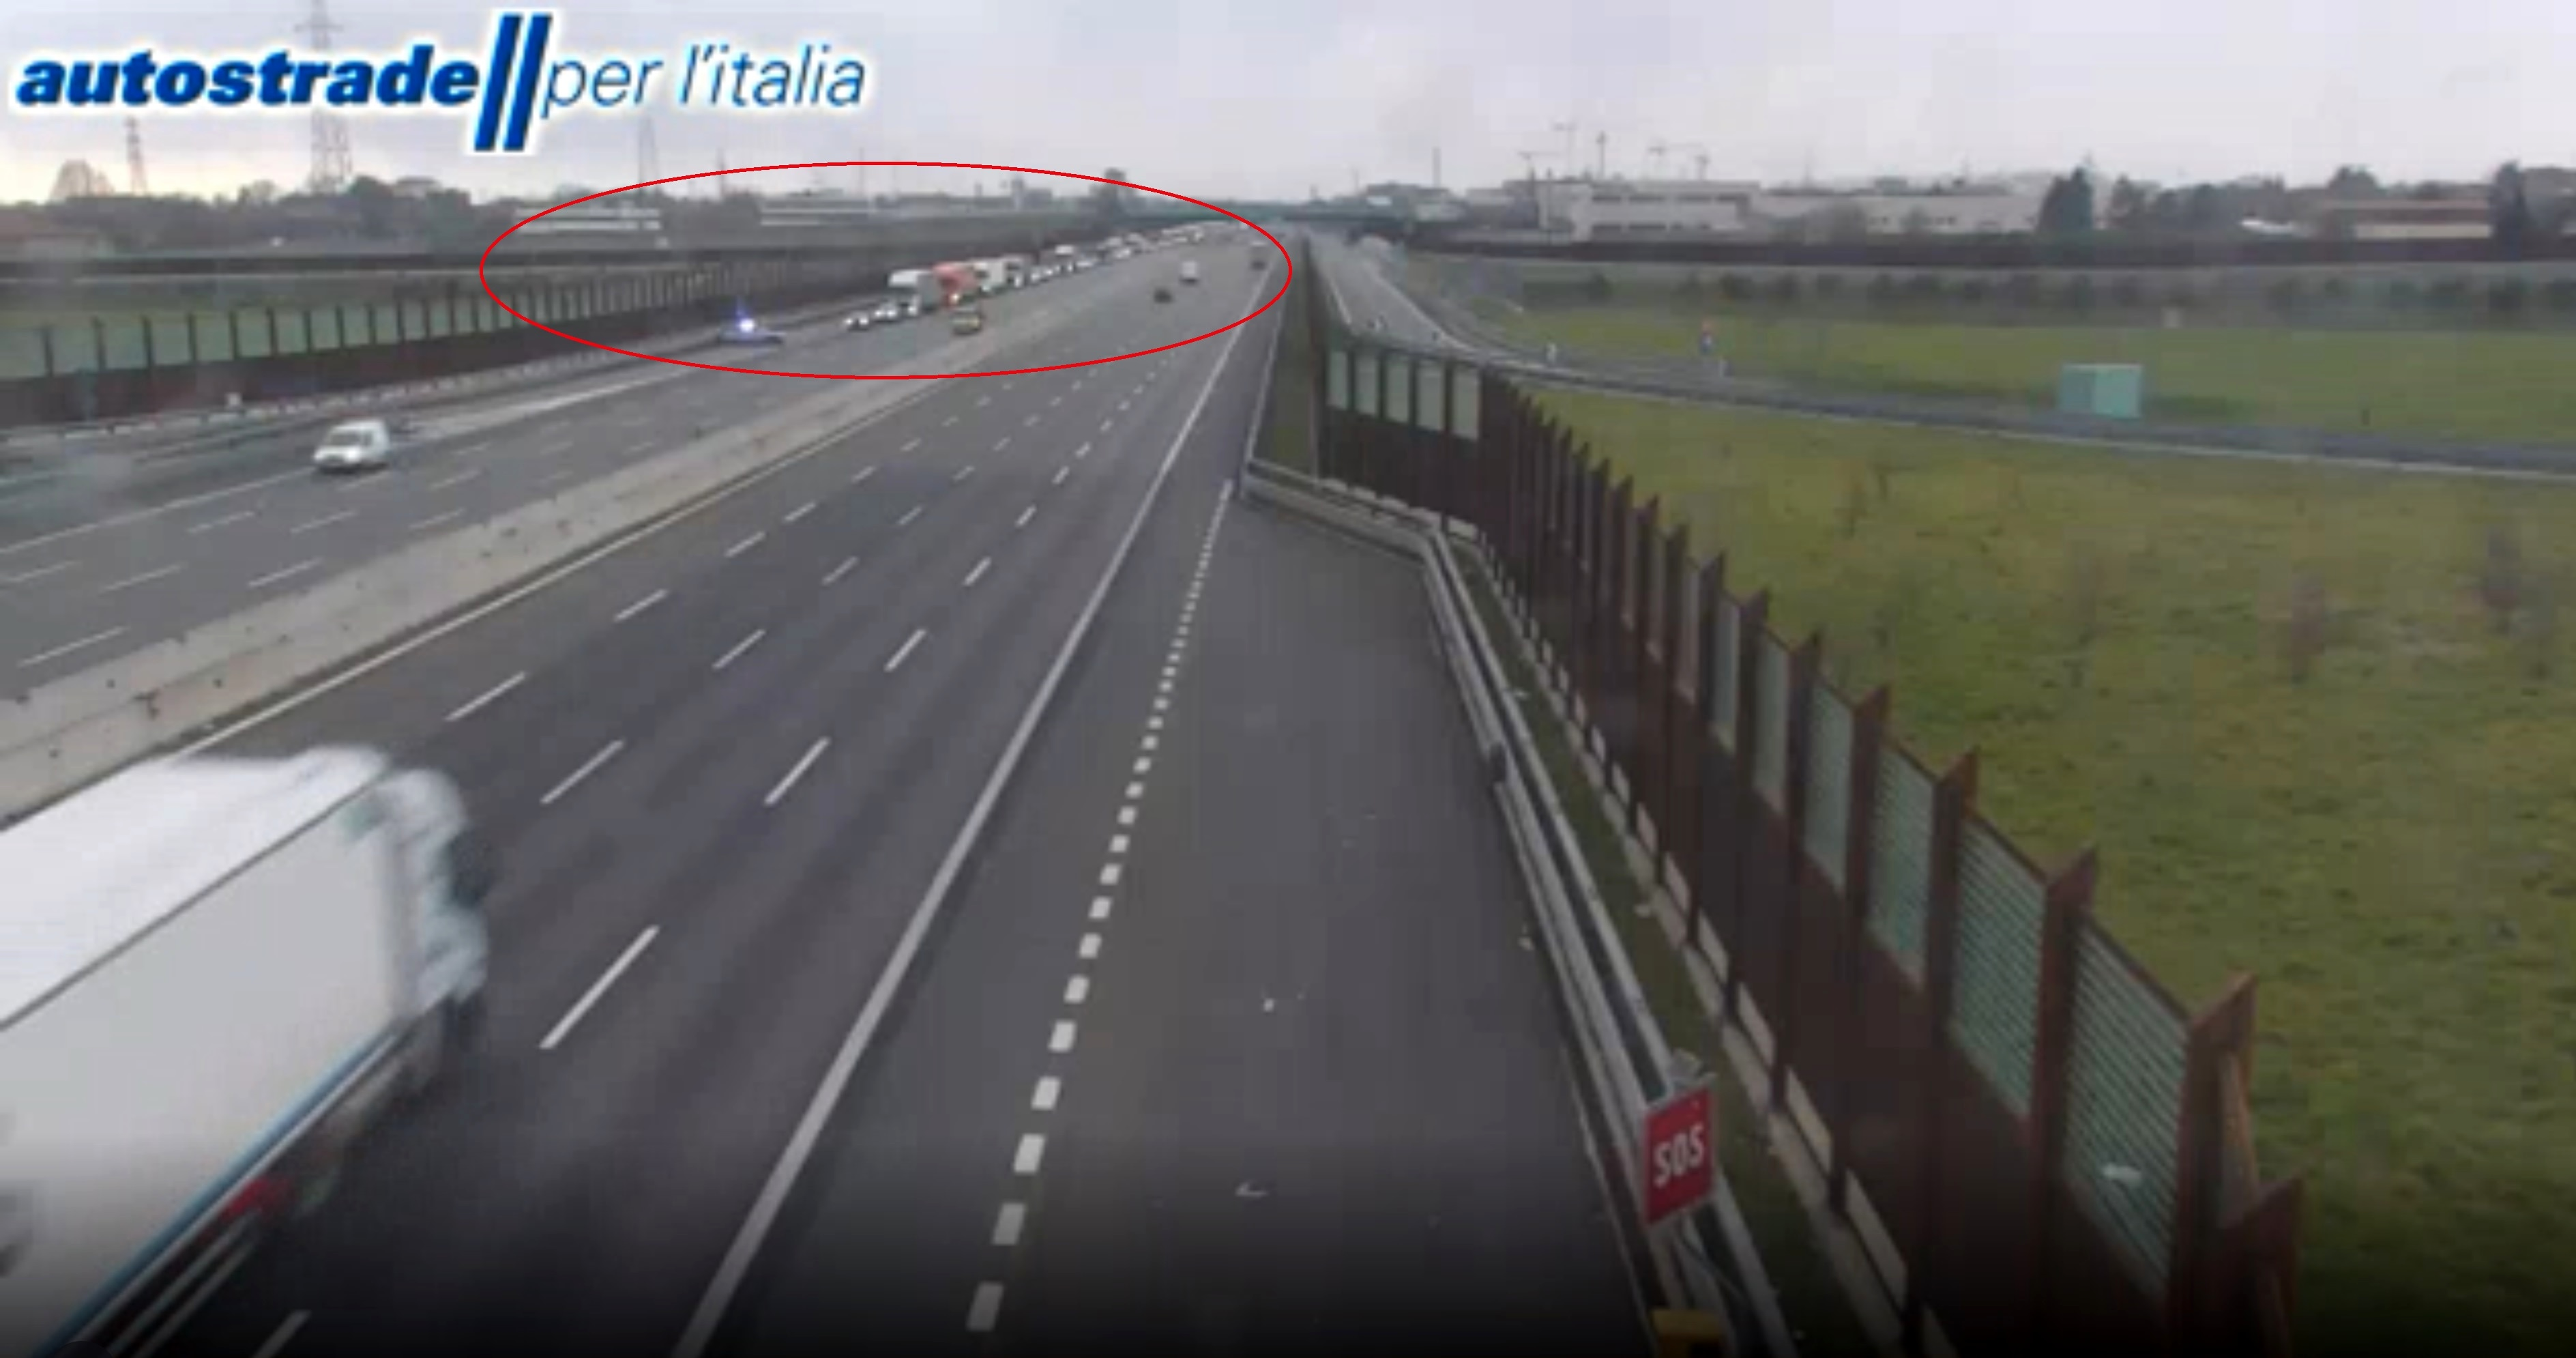 Autostrada uscita obbligatoria polizia